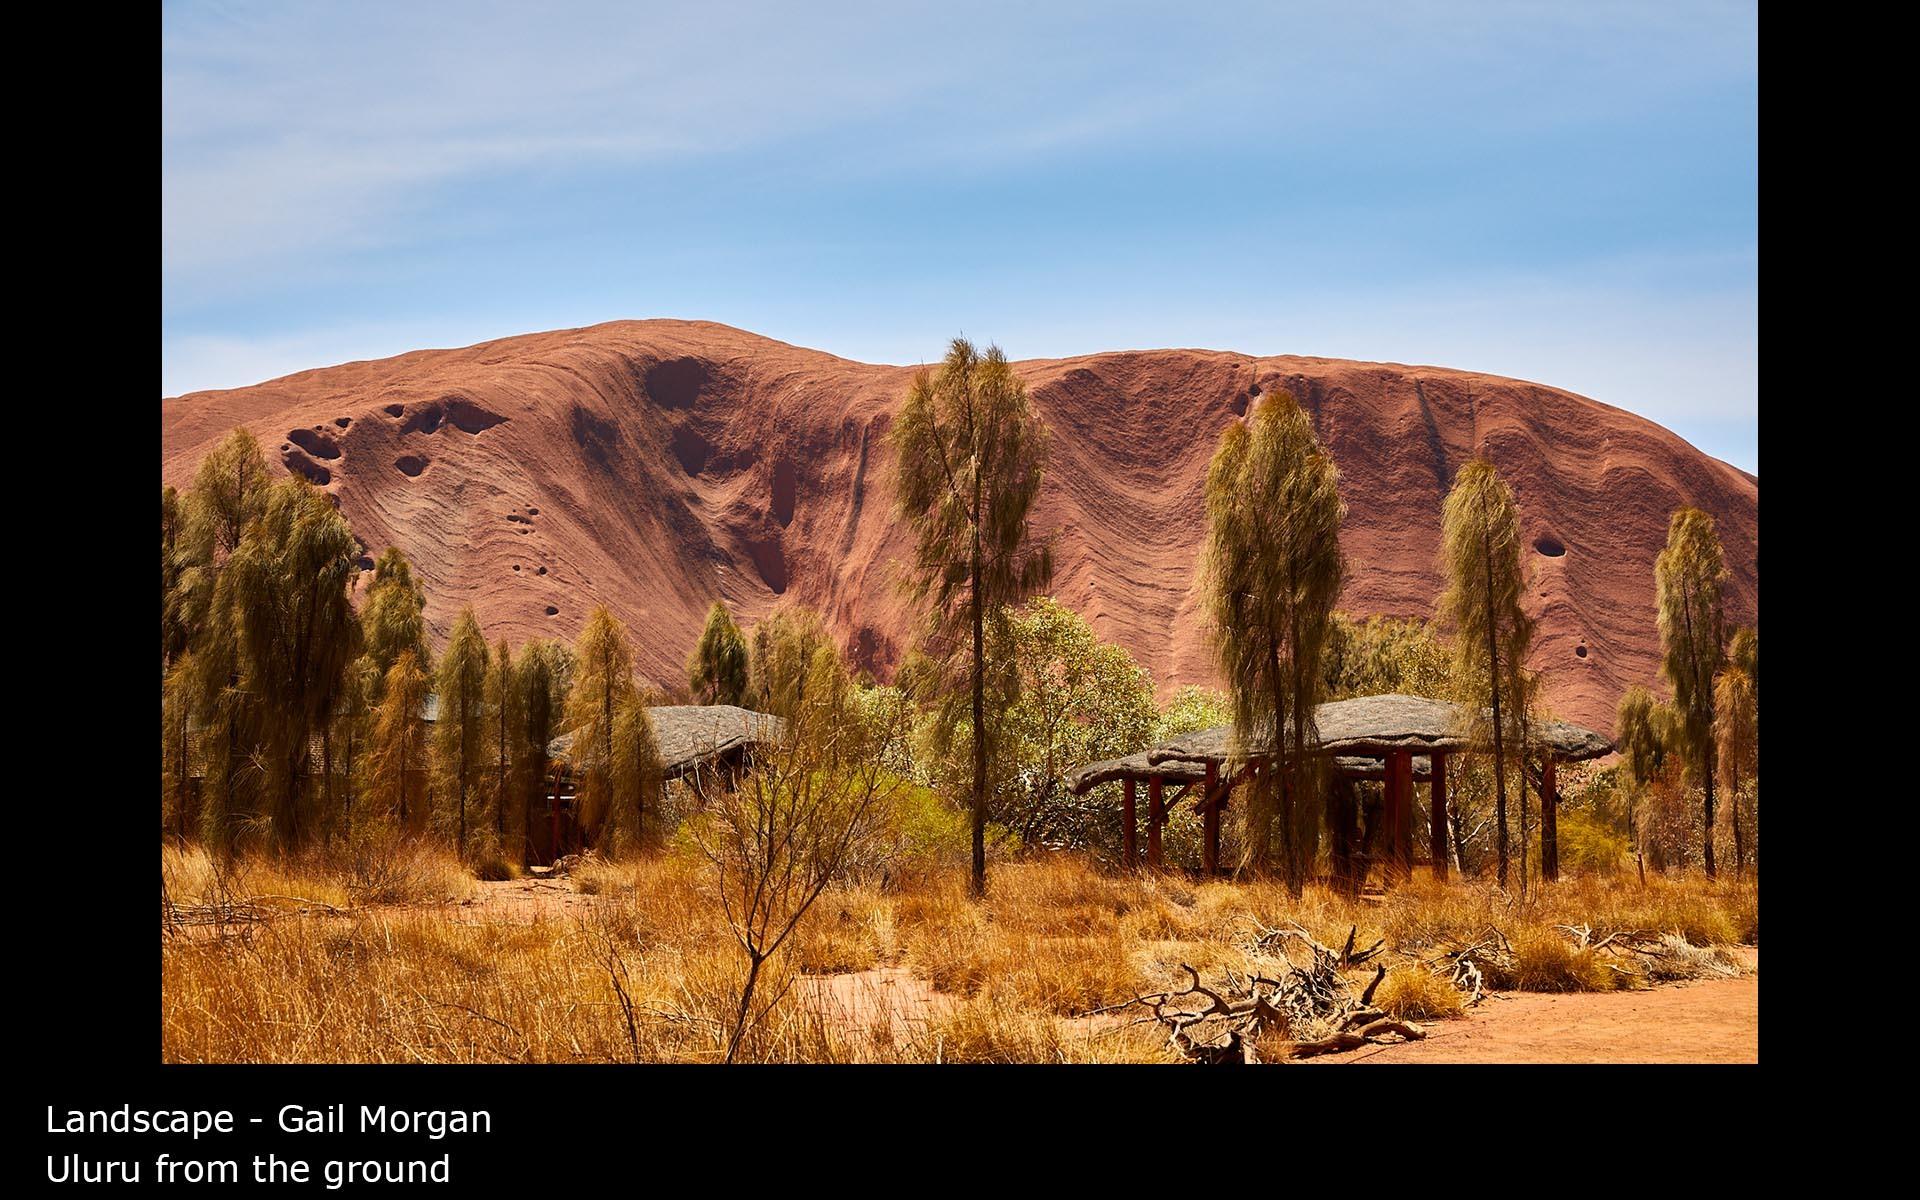 Uluru from the ground - Gail Morgan